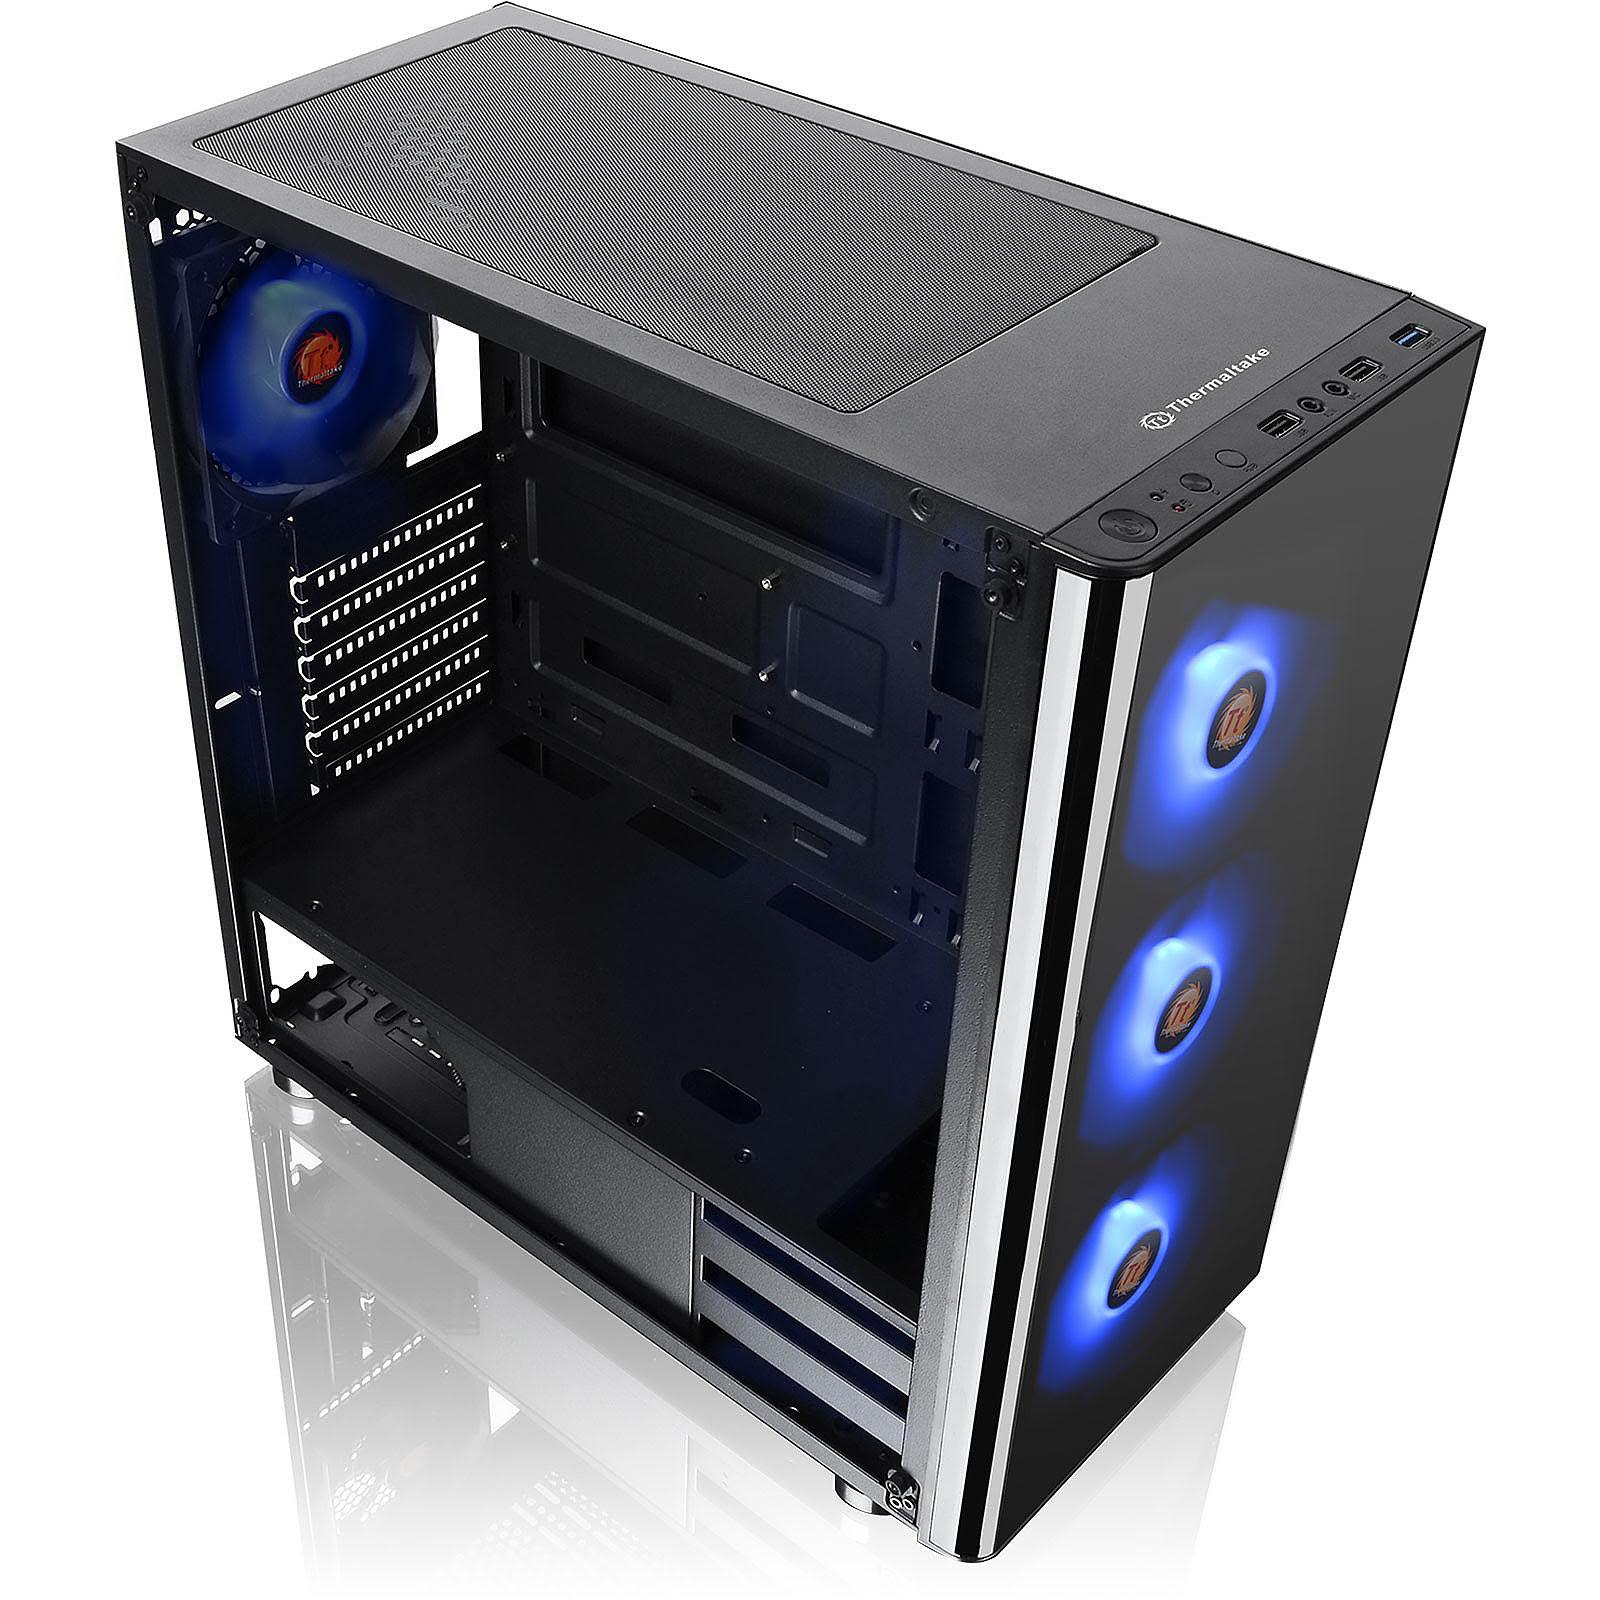 Thermaltake V200 TG RGB Edition Noir - Boîtier PC Thermaltake - 3